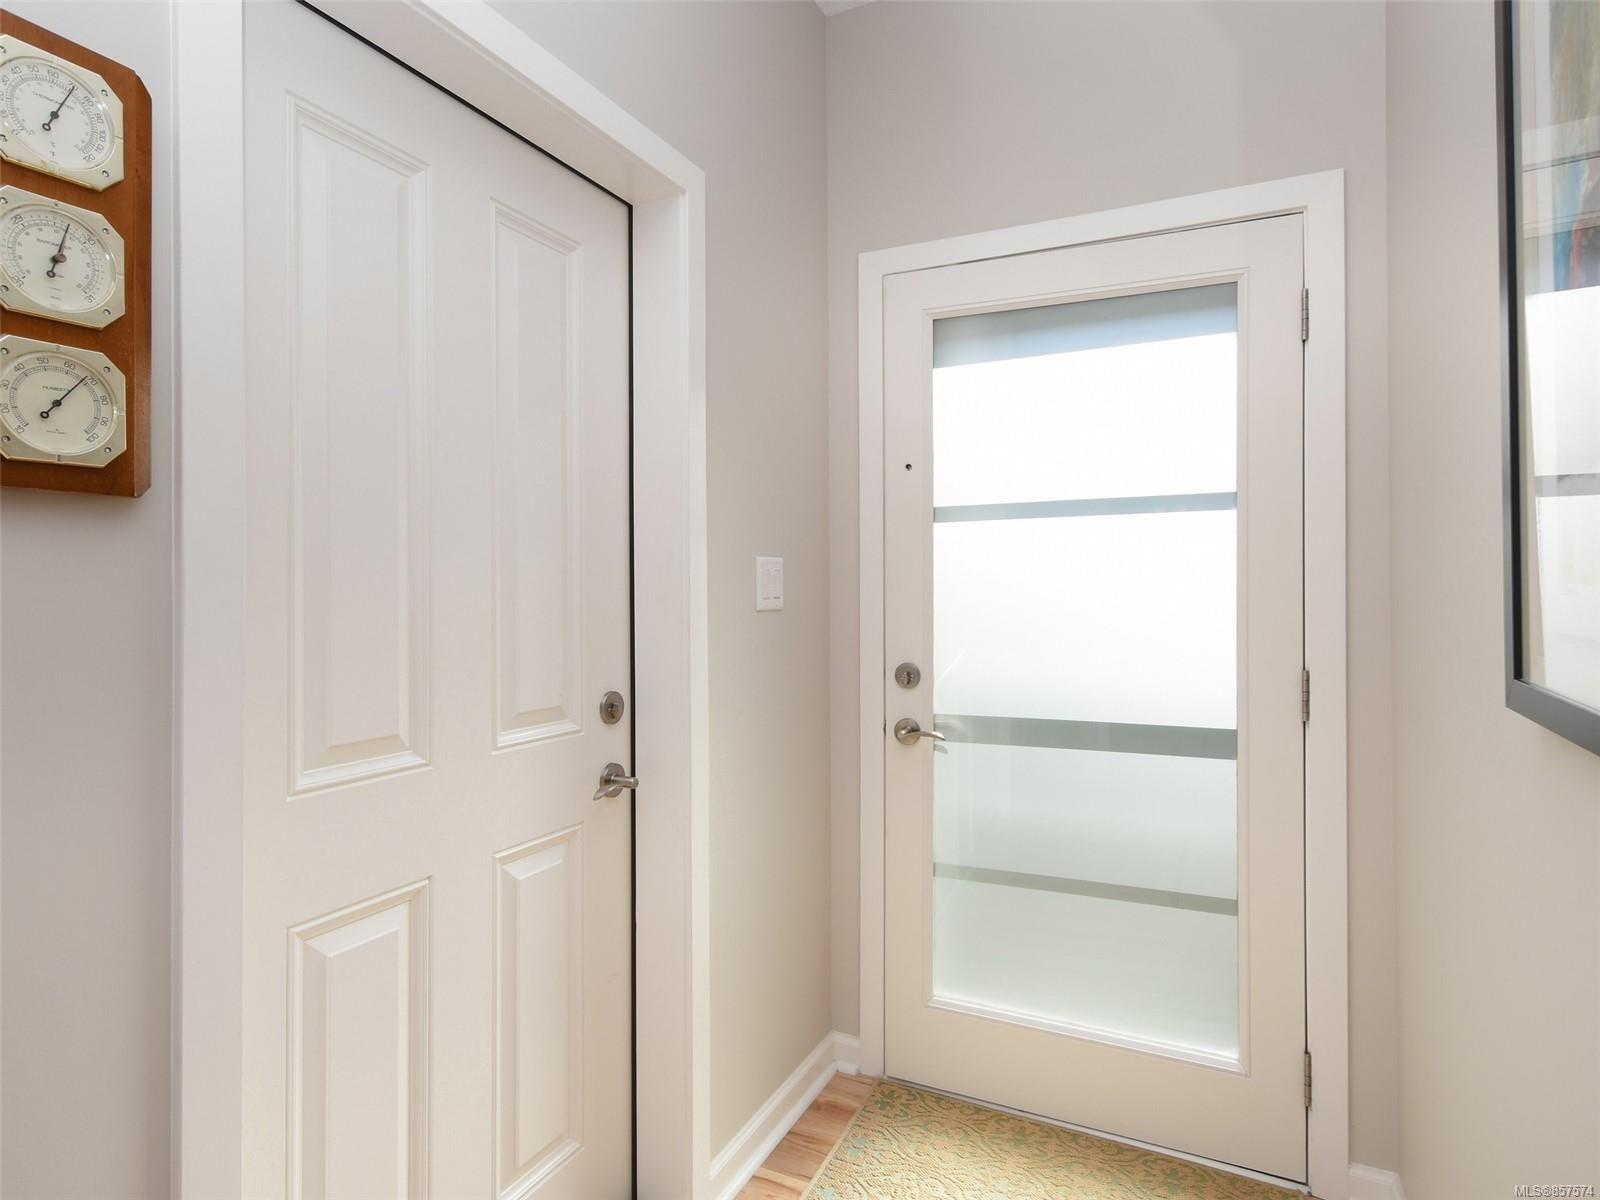 Photo 18: Photos: 6376 Shambrook Dr in : Sk Sunriver House for sale (Sooke)  : MLS®# 857574